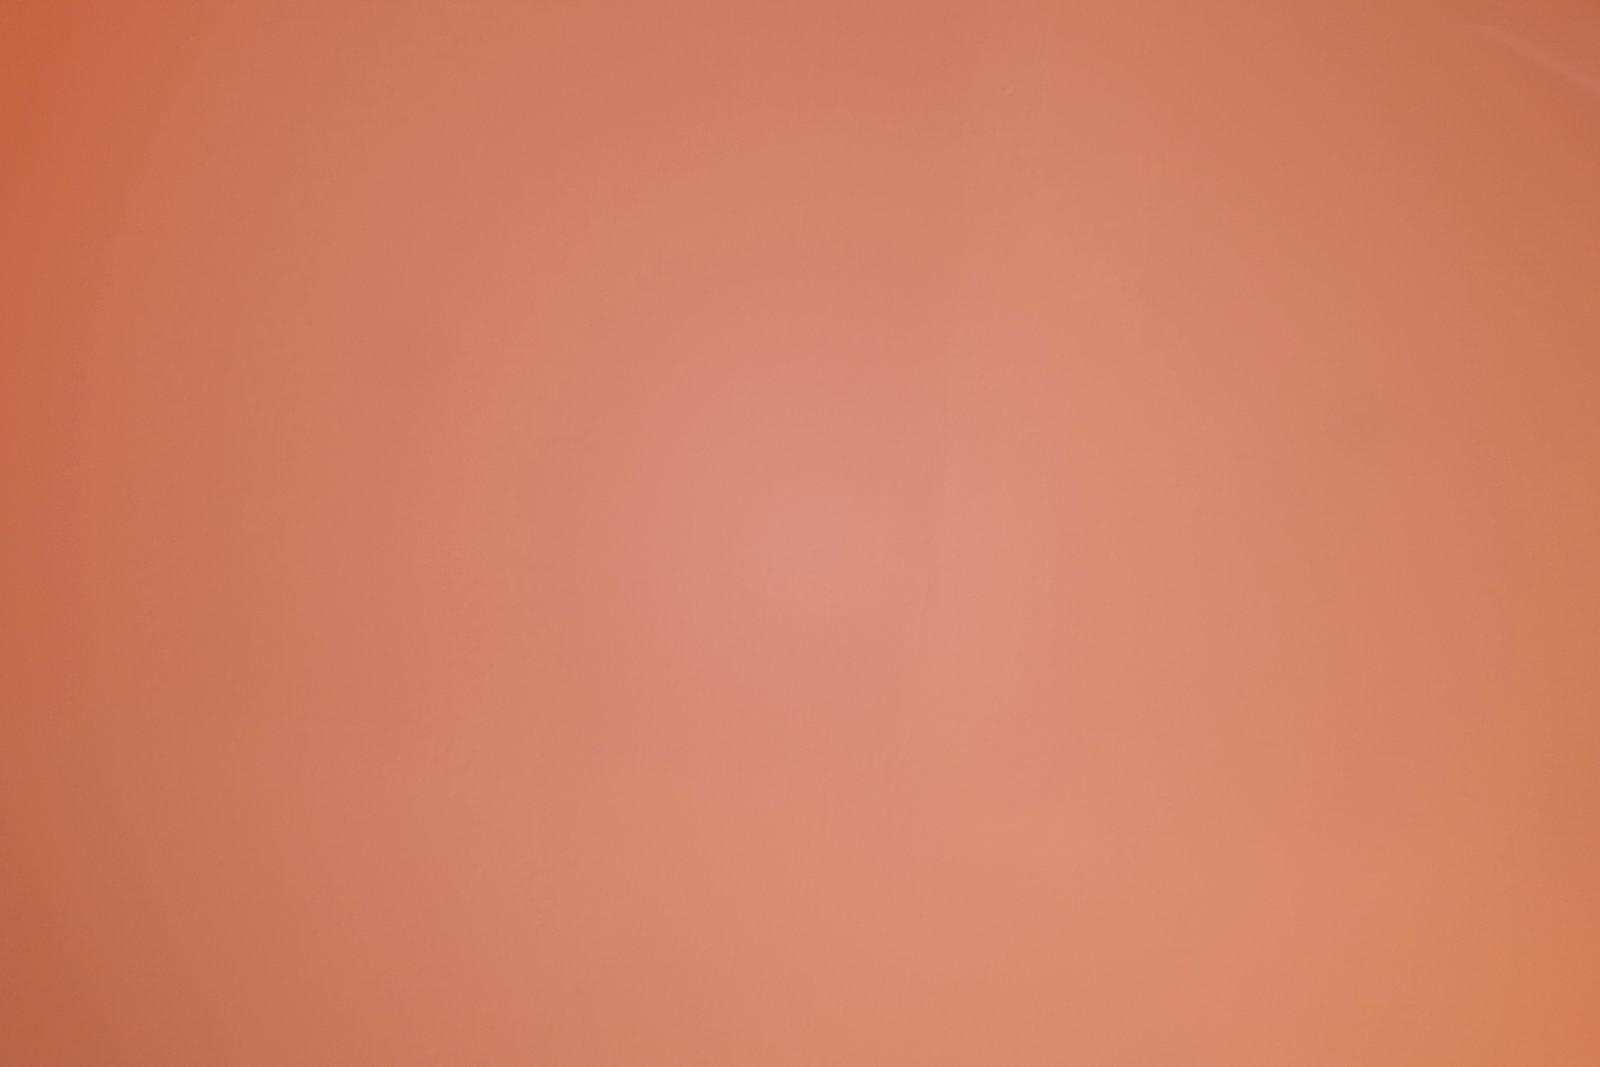 test infrarouge HOTSPOT 24mm F8 SIGMA | Pierre-Louis Ferrer | Test du SIGMA 24mm F/1.4 DG HSM Art en photographie infrarouge | Partie 1